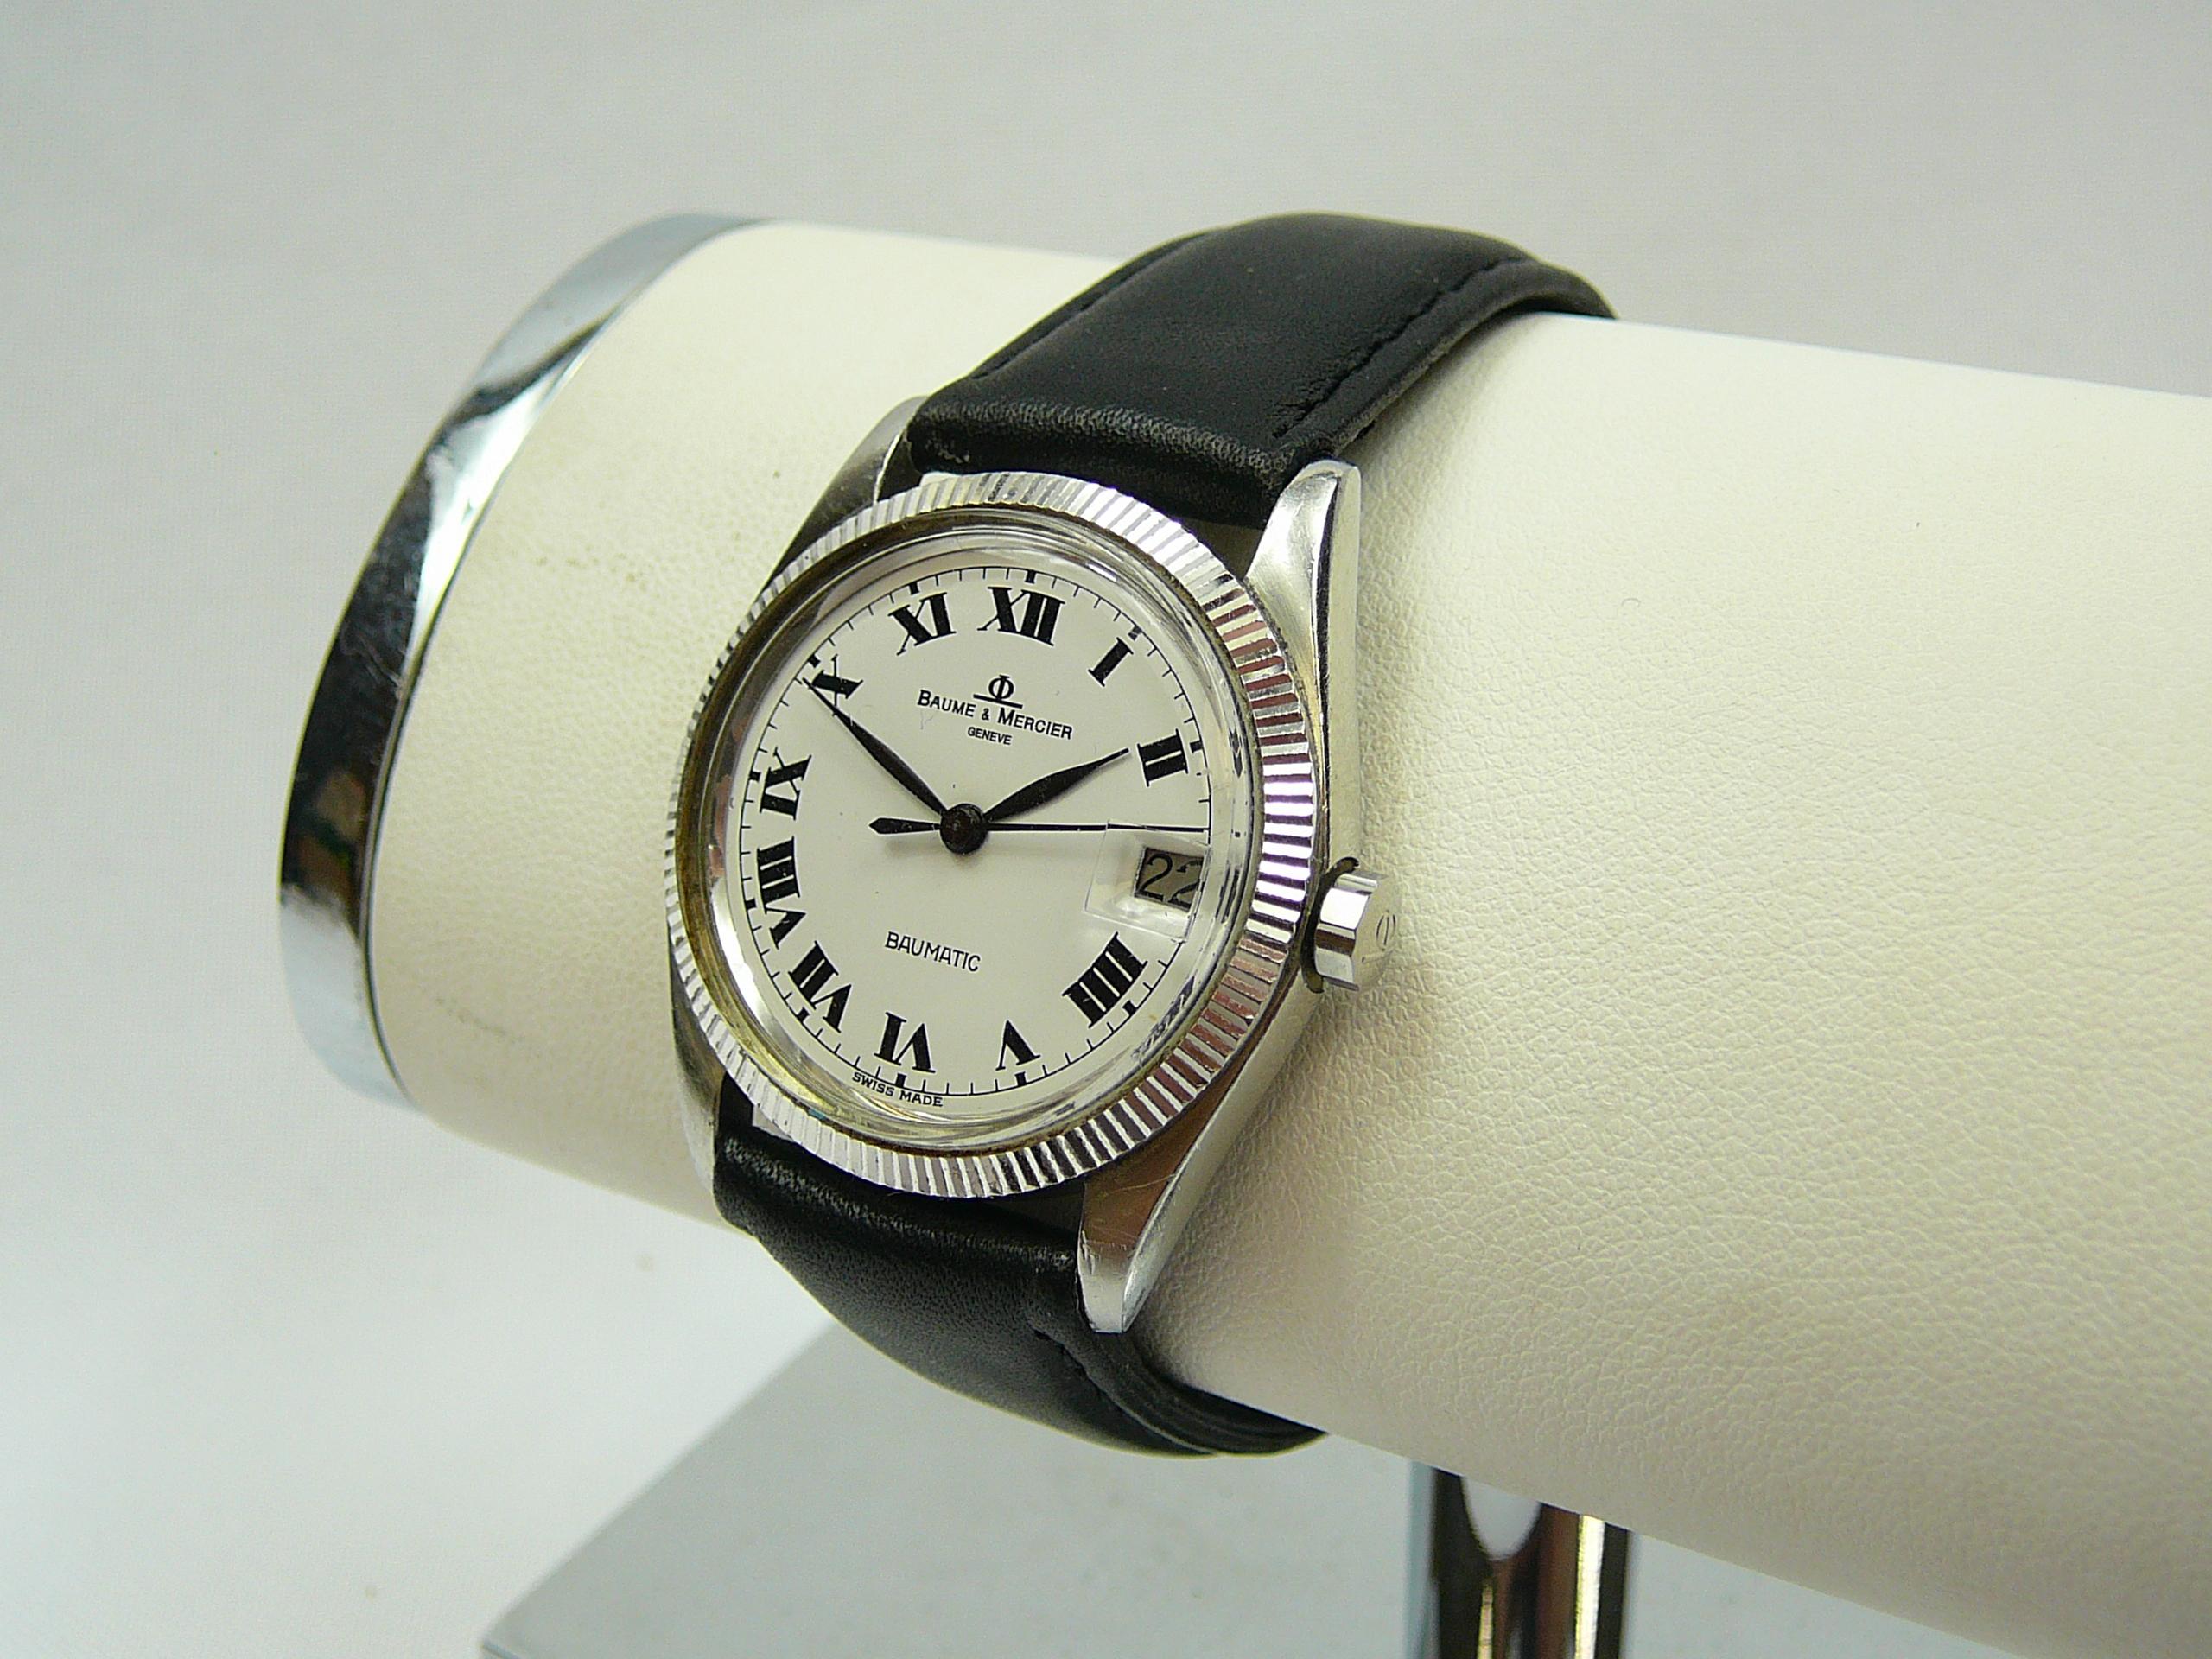 Mid Size Baume & Mercier Wrist Watch